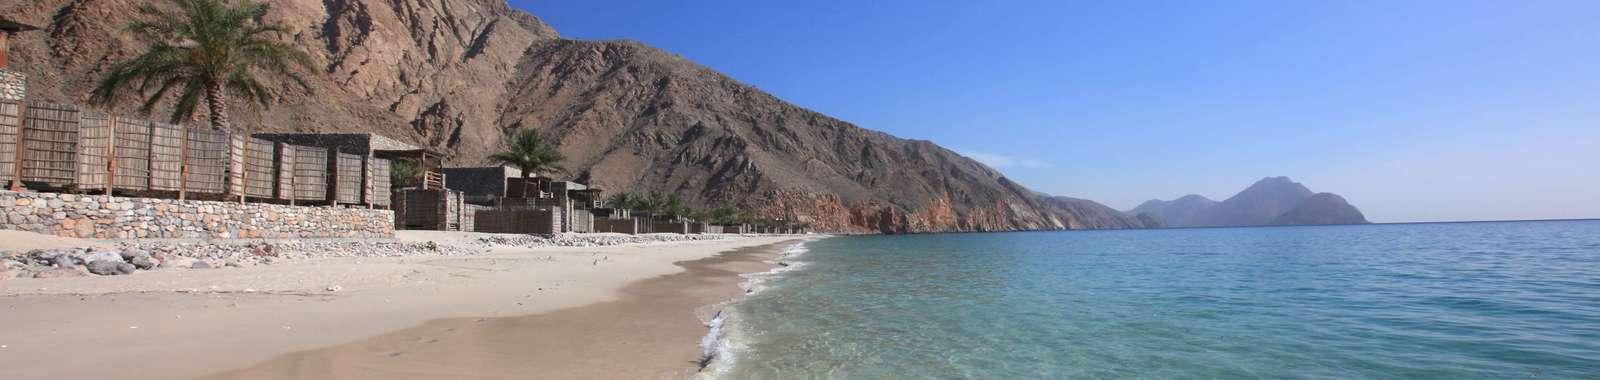 Beach_at_Six_Senses_Zighy_Bay_[731-A4]